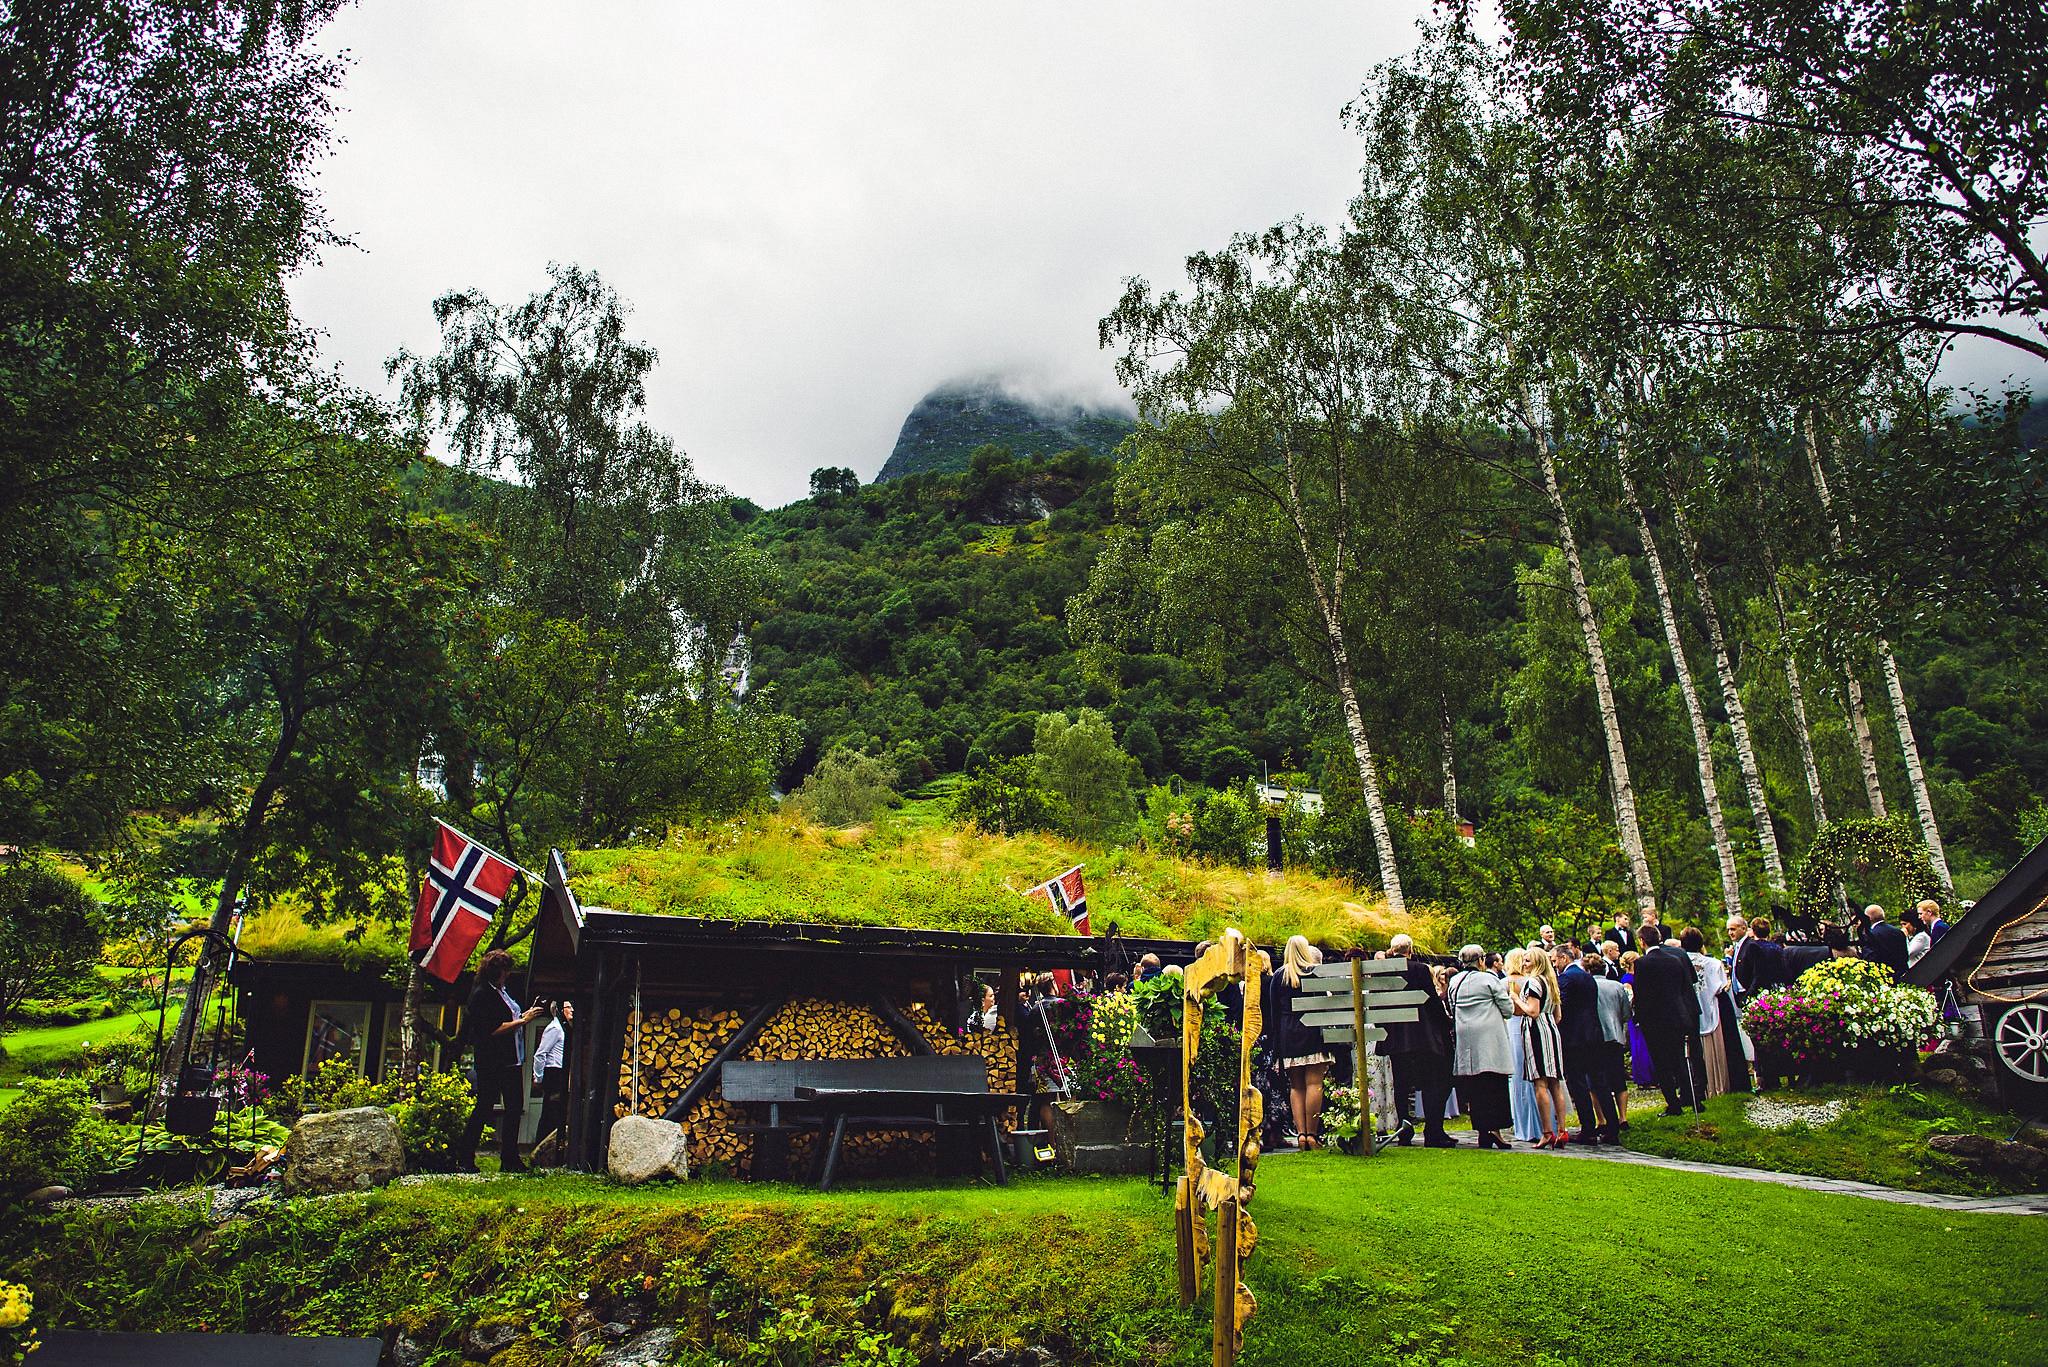 Bryllup på Yrineset i Oldedalen bryllupsfotograf sogn og fjordane-21.jpg